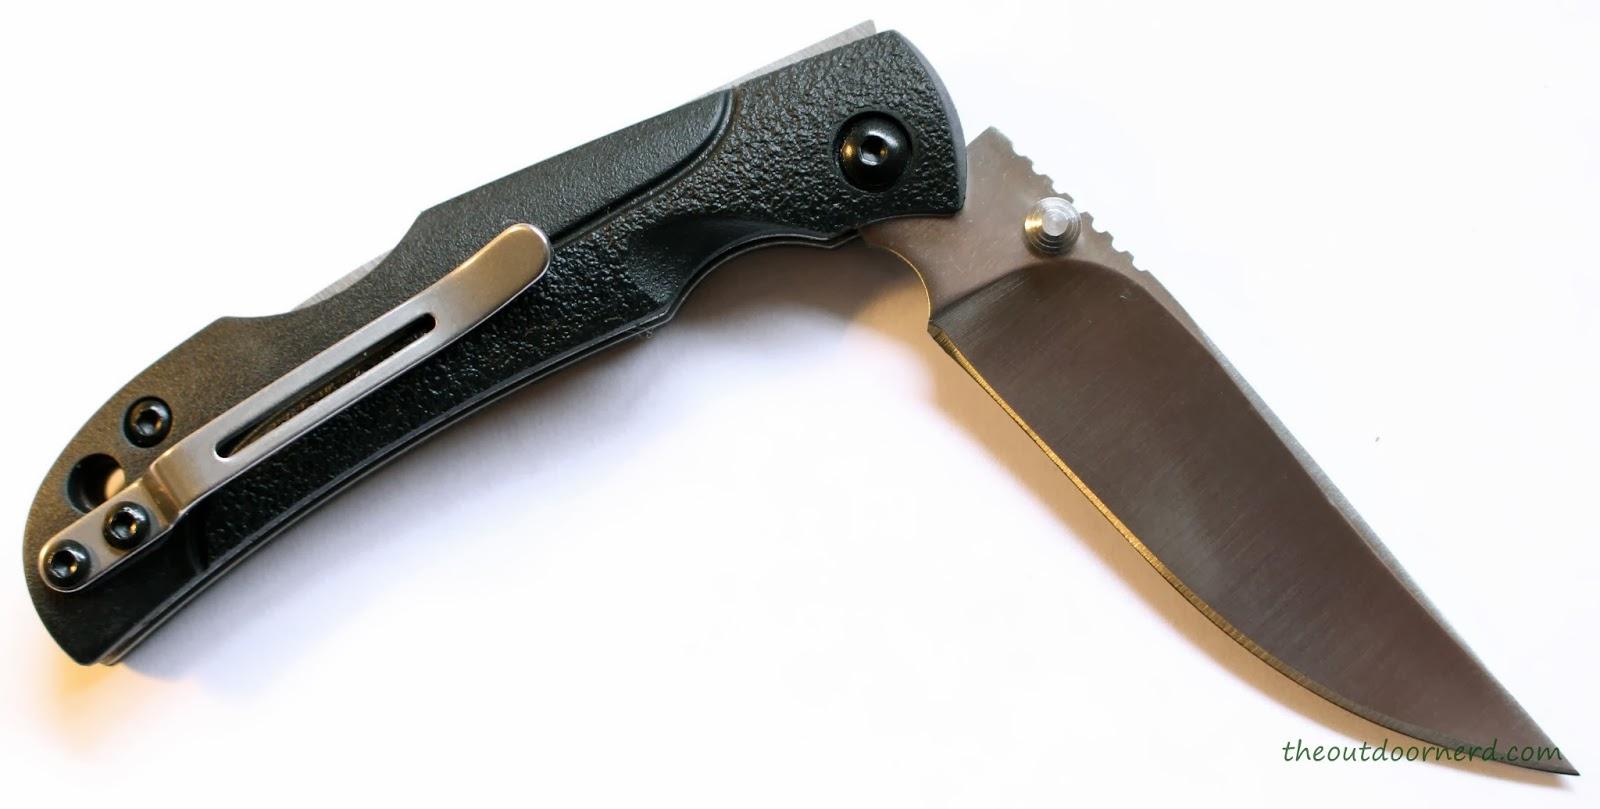 SanRenMu ZB-681 Pocket Knife - Product View